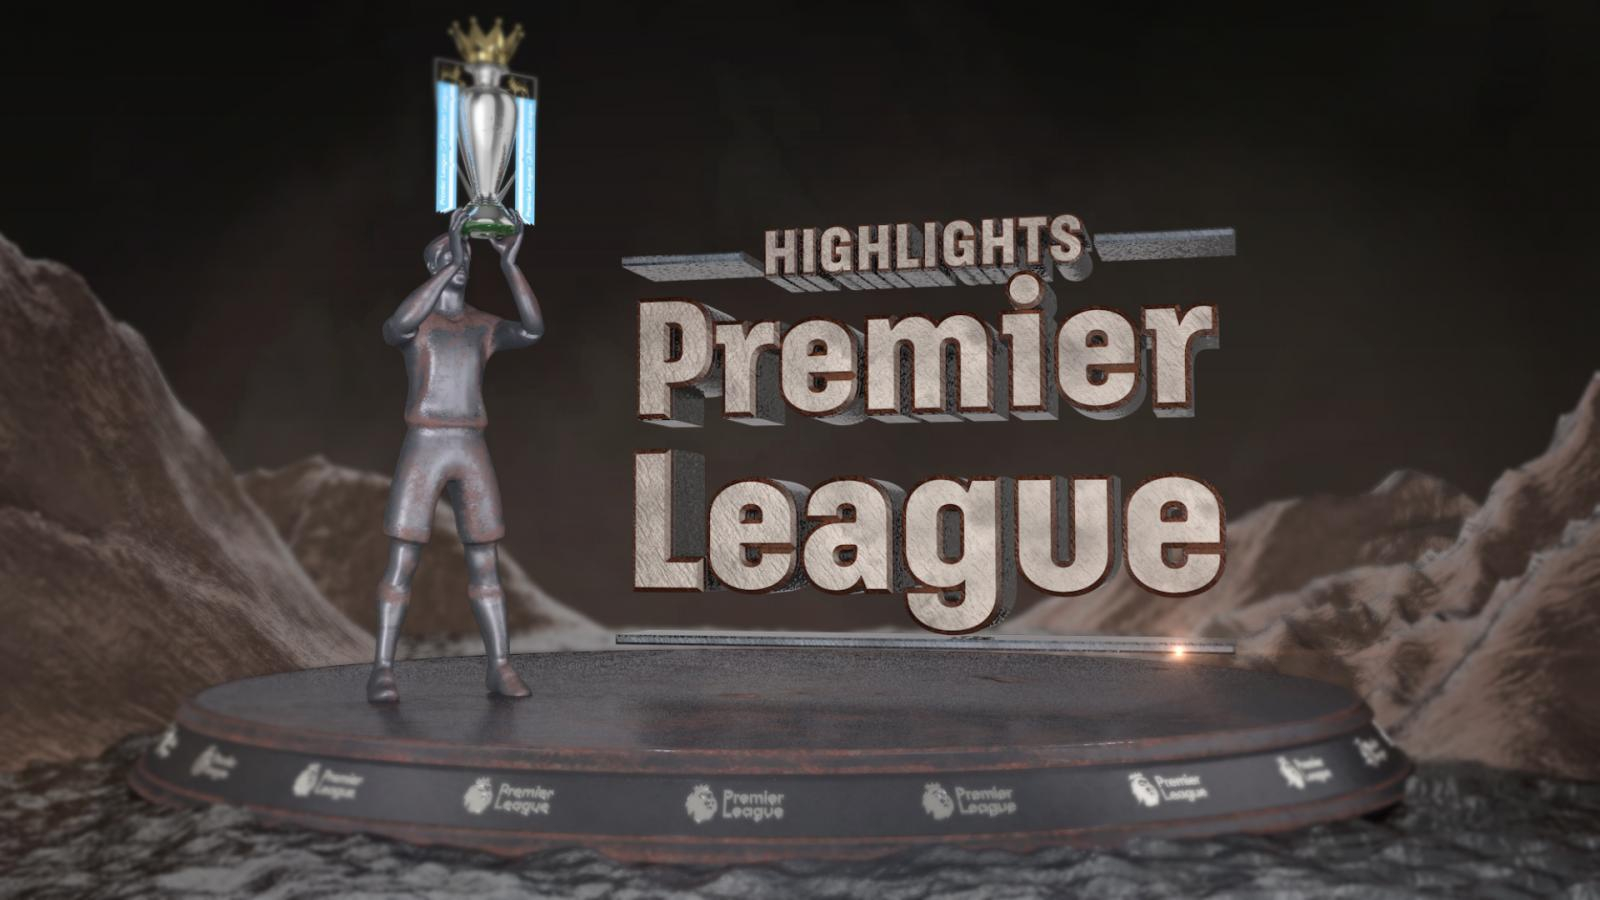 Highlights Premier League